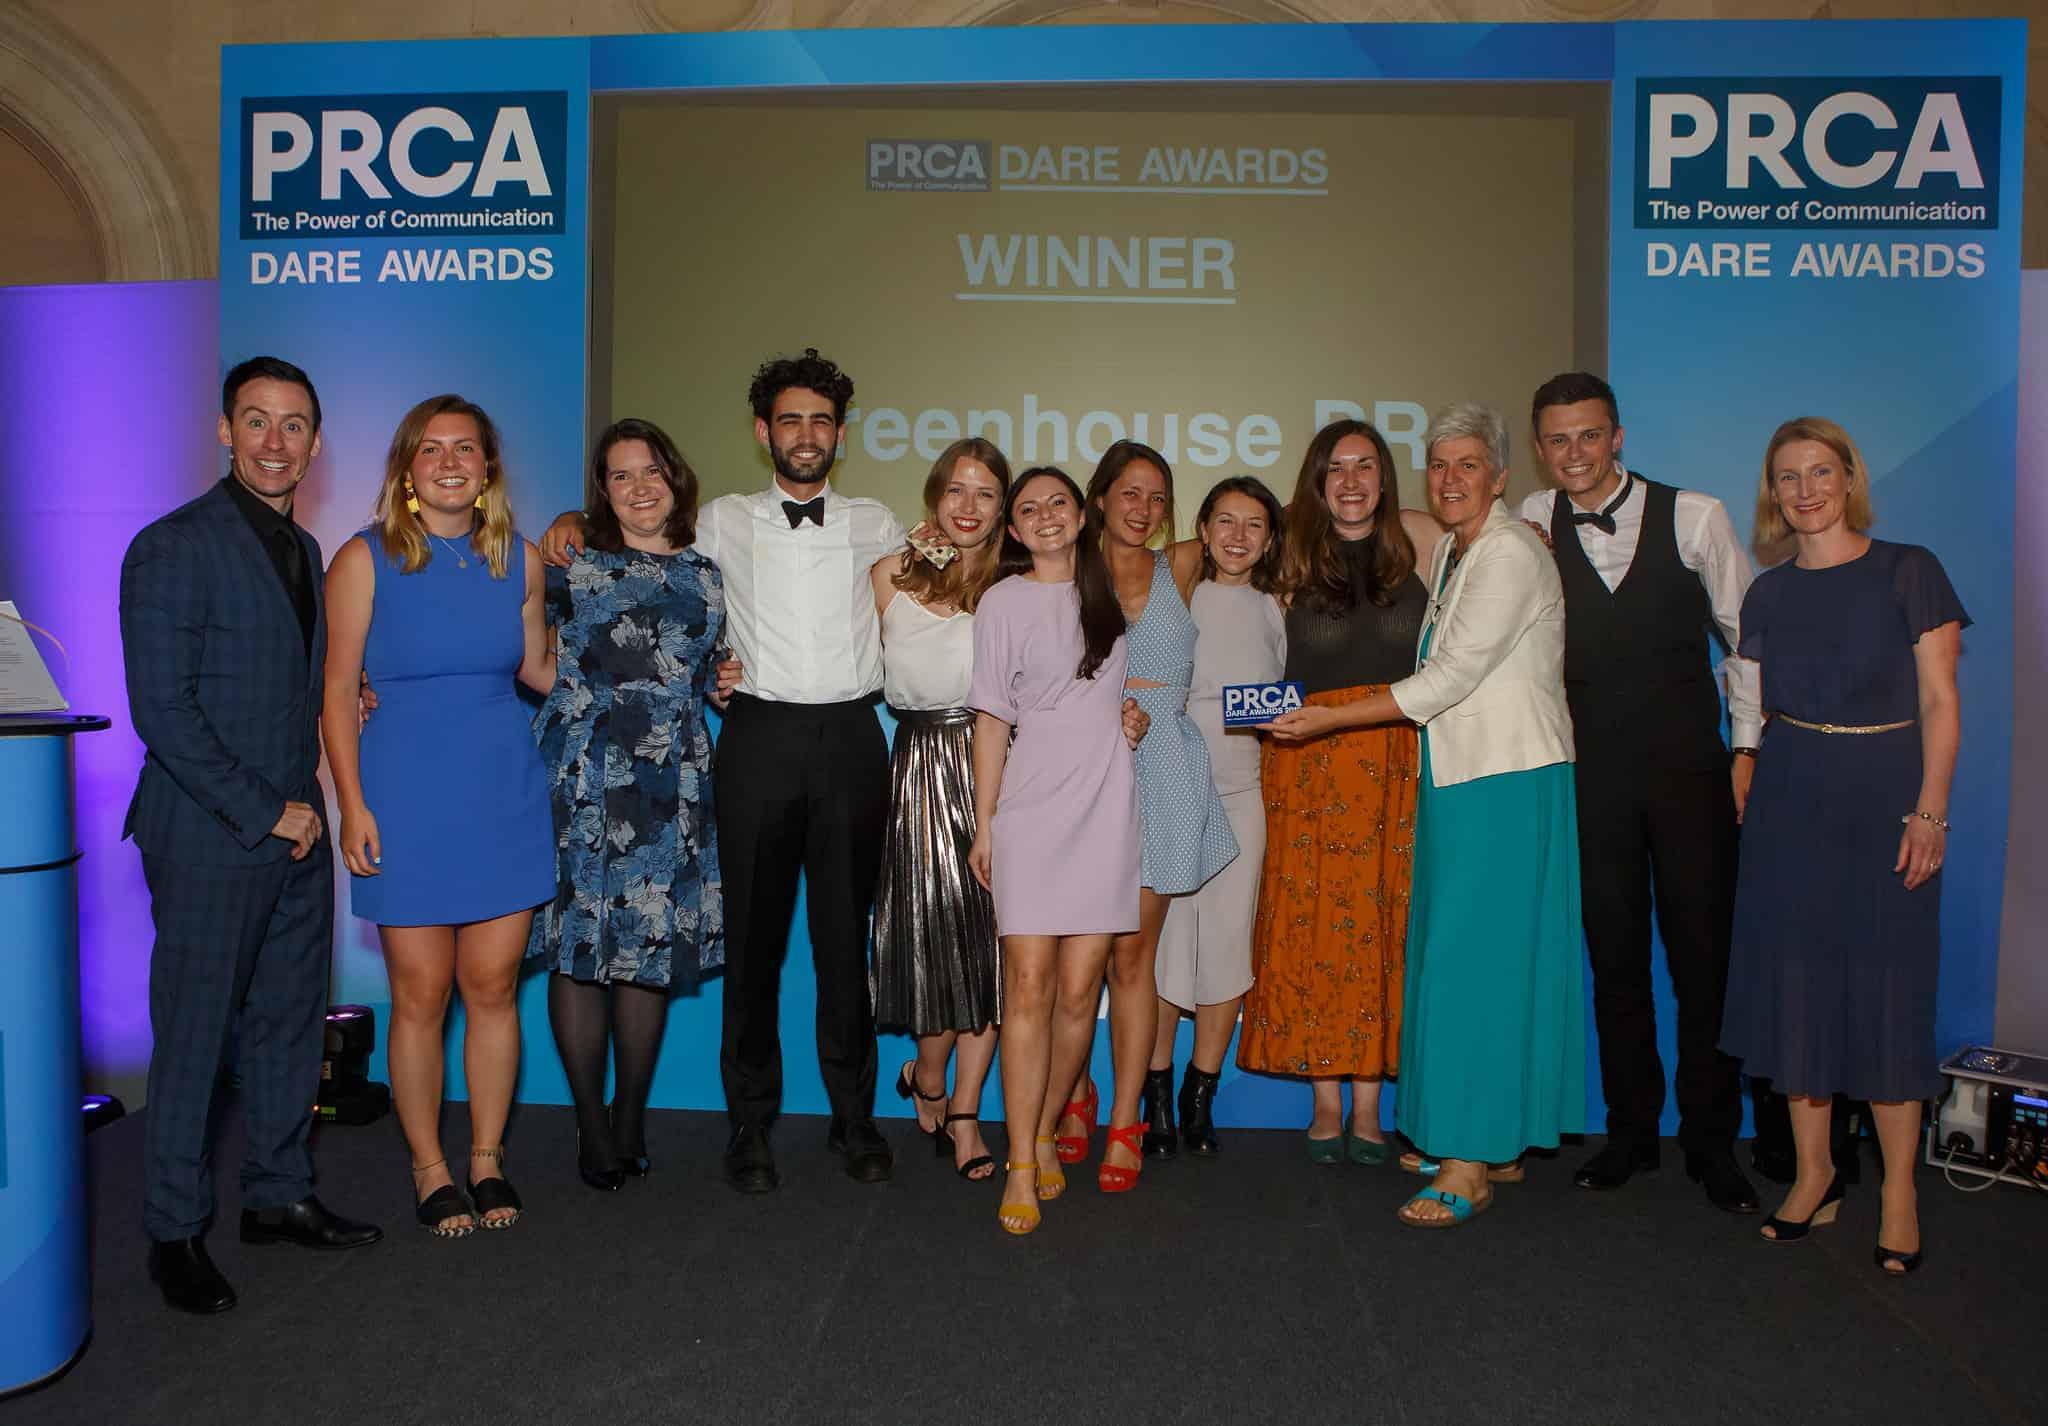 PRCA Dare Awards